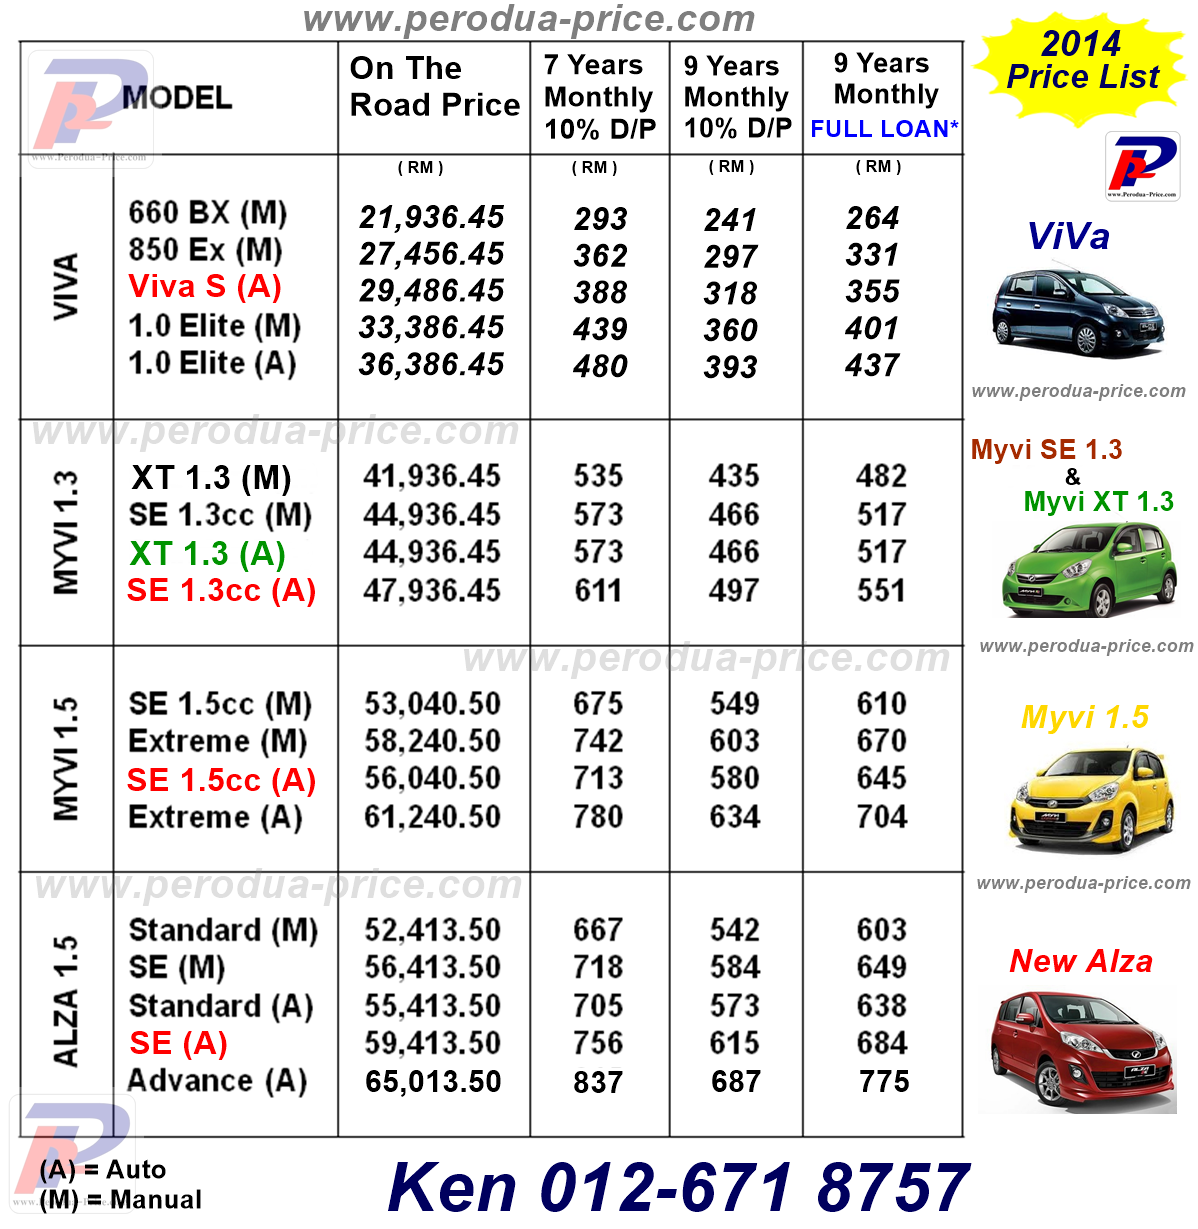 Perodua Price List